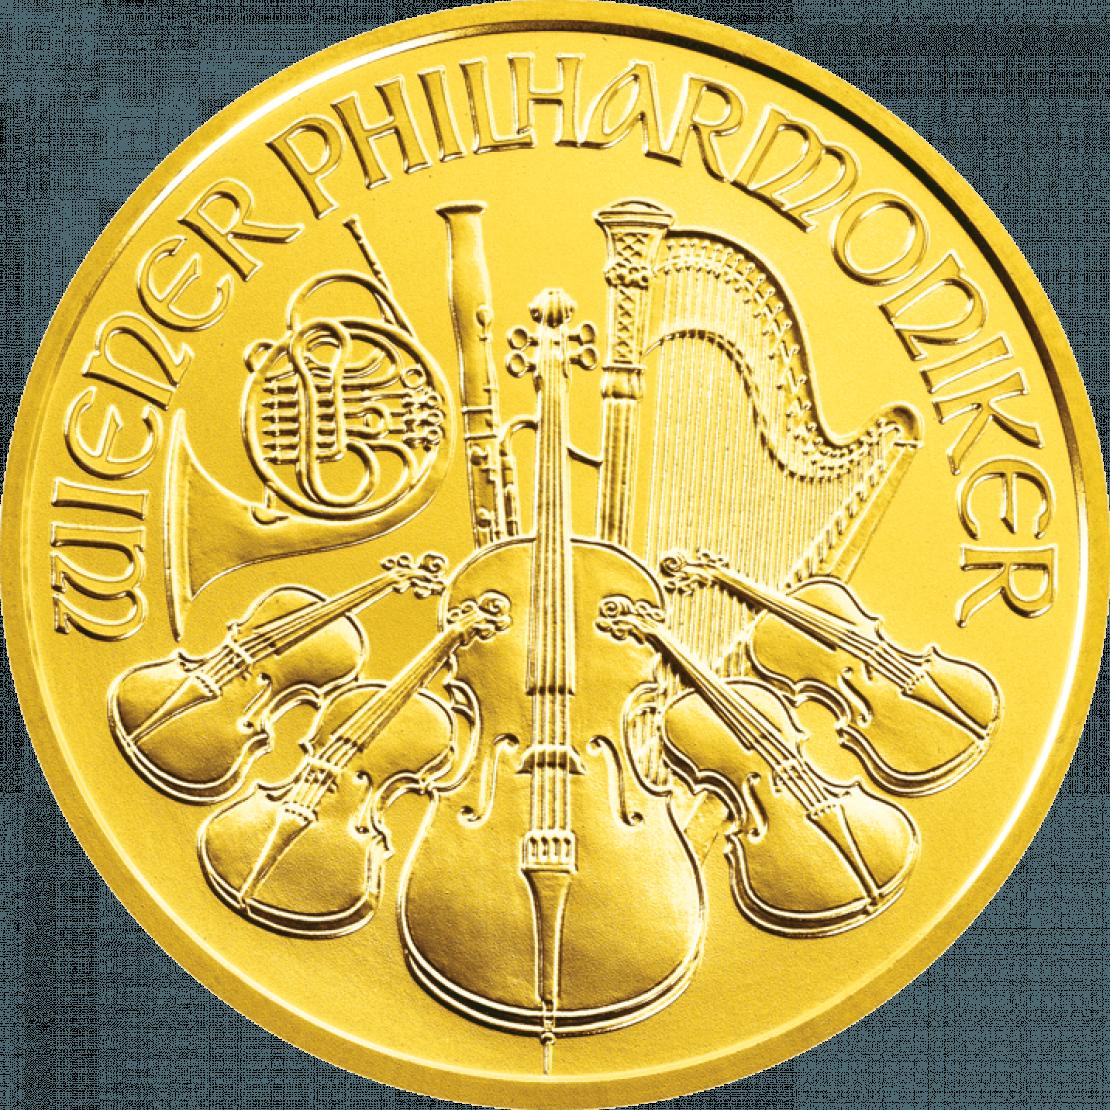 Philharmoniker Gold RV